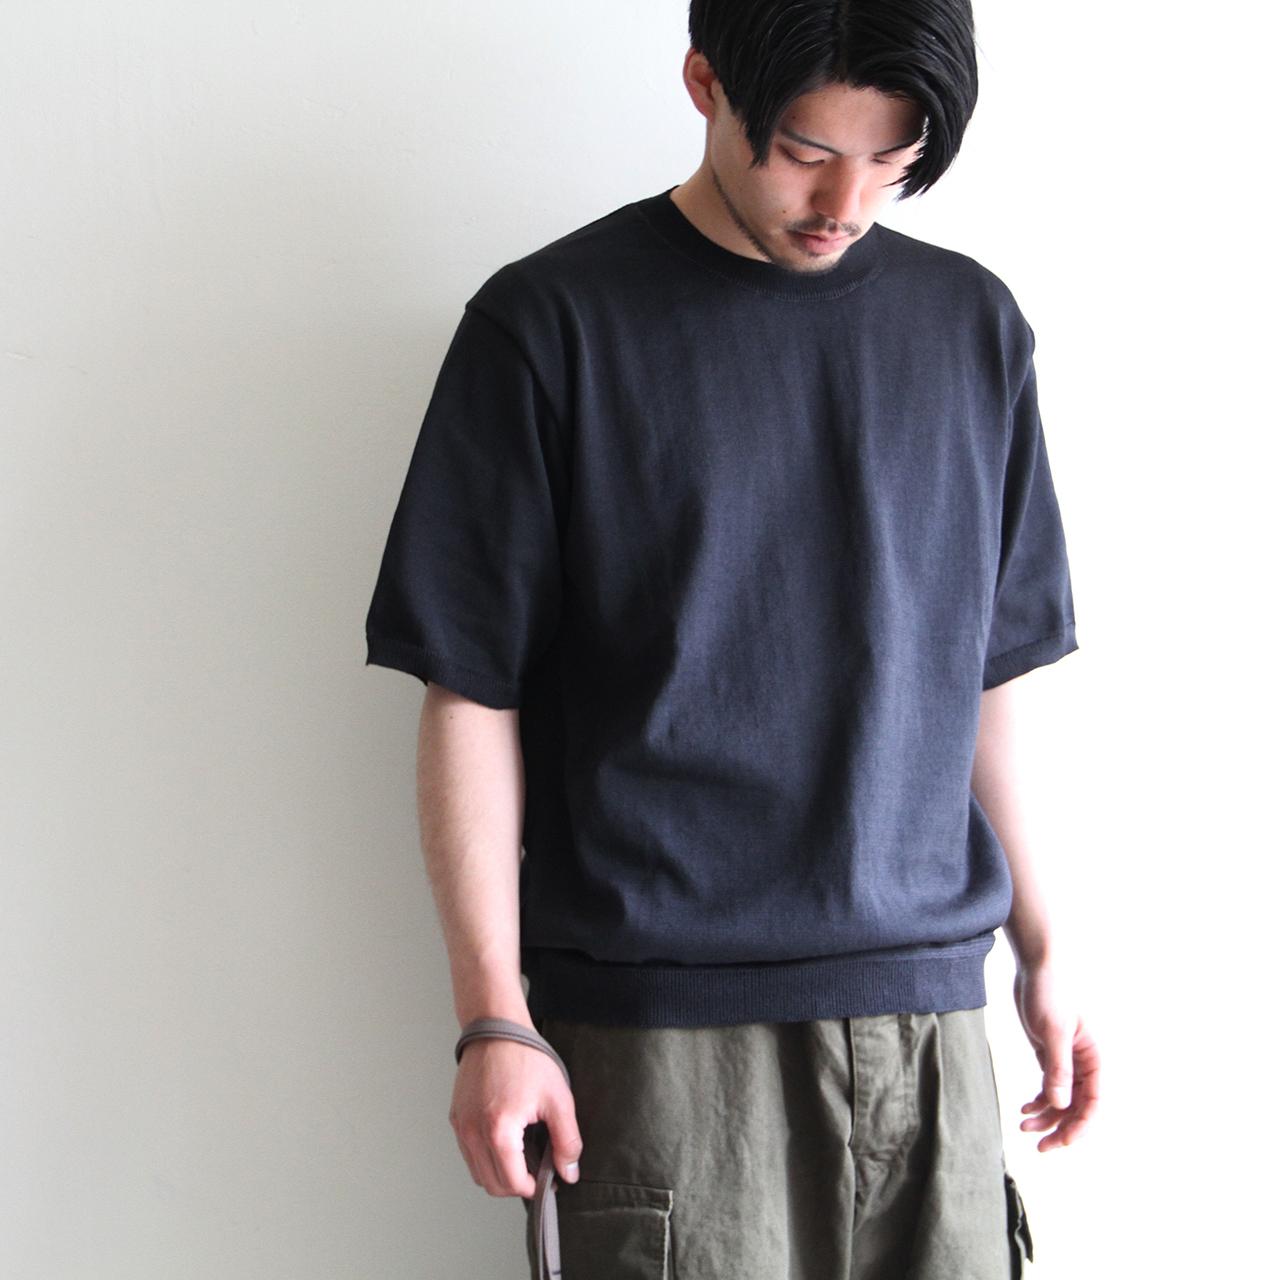 STILL BY HAND【 mens 】pe/ramie crew neck knit